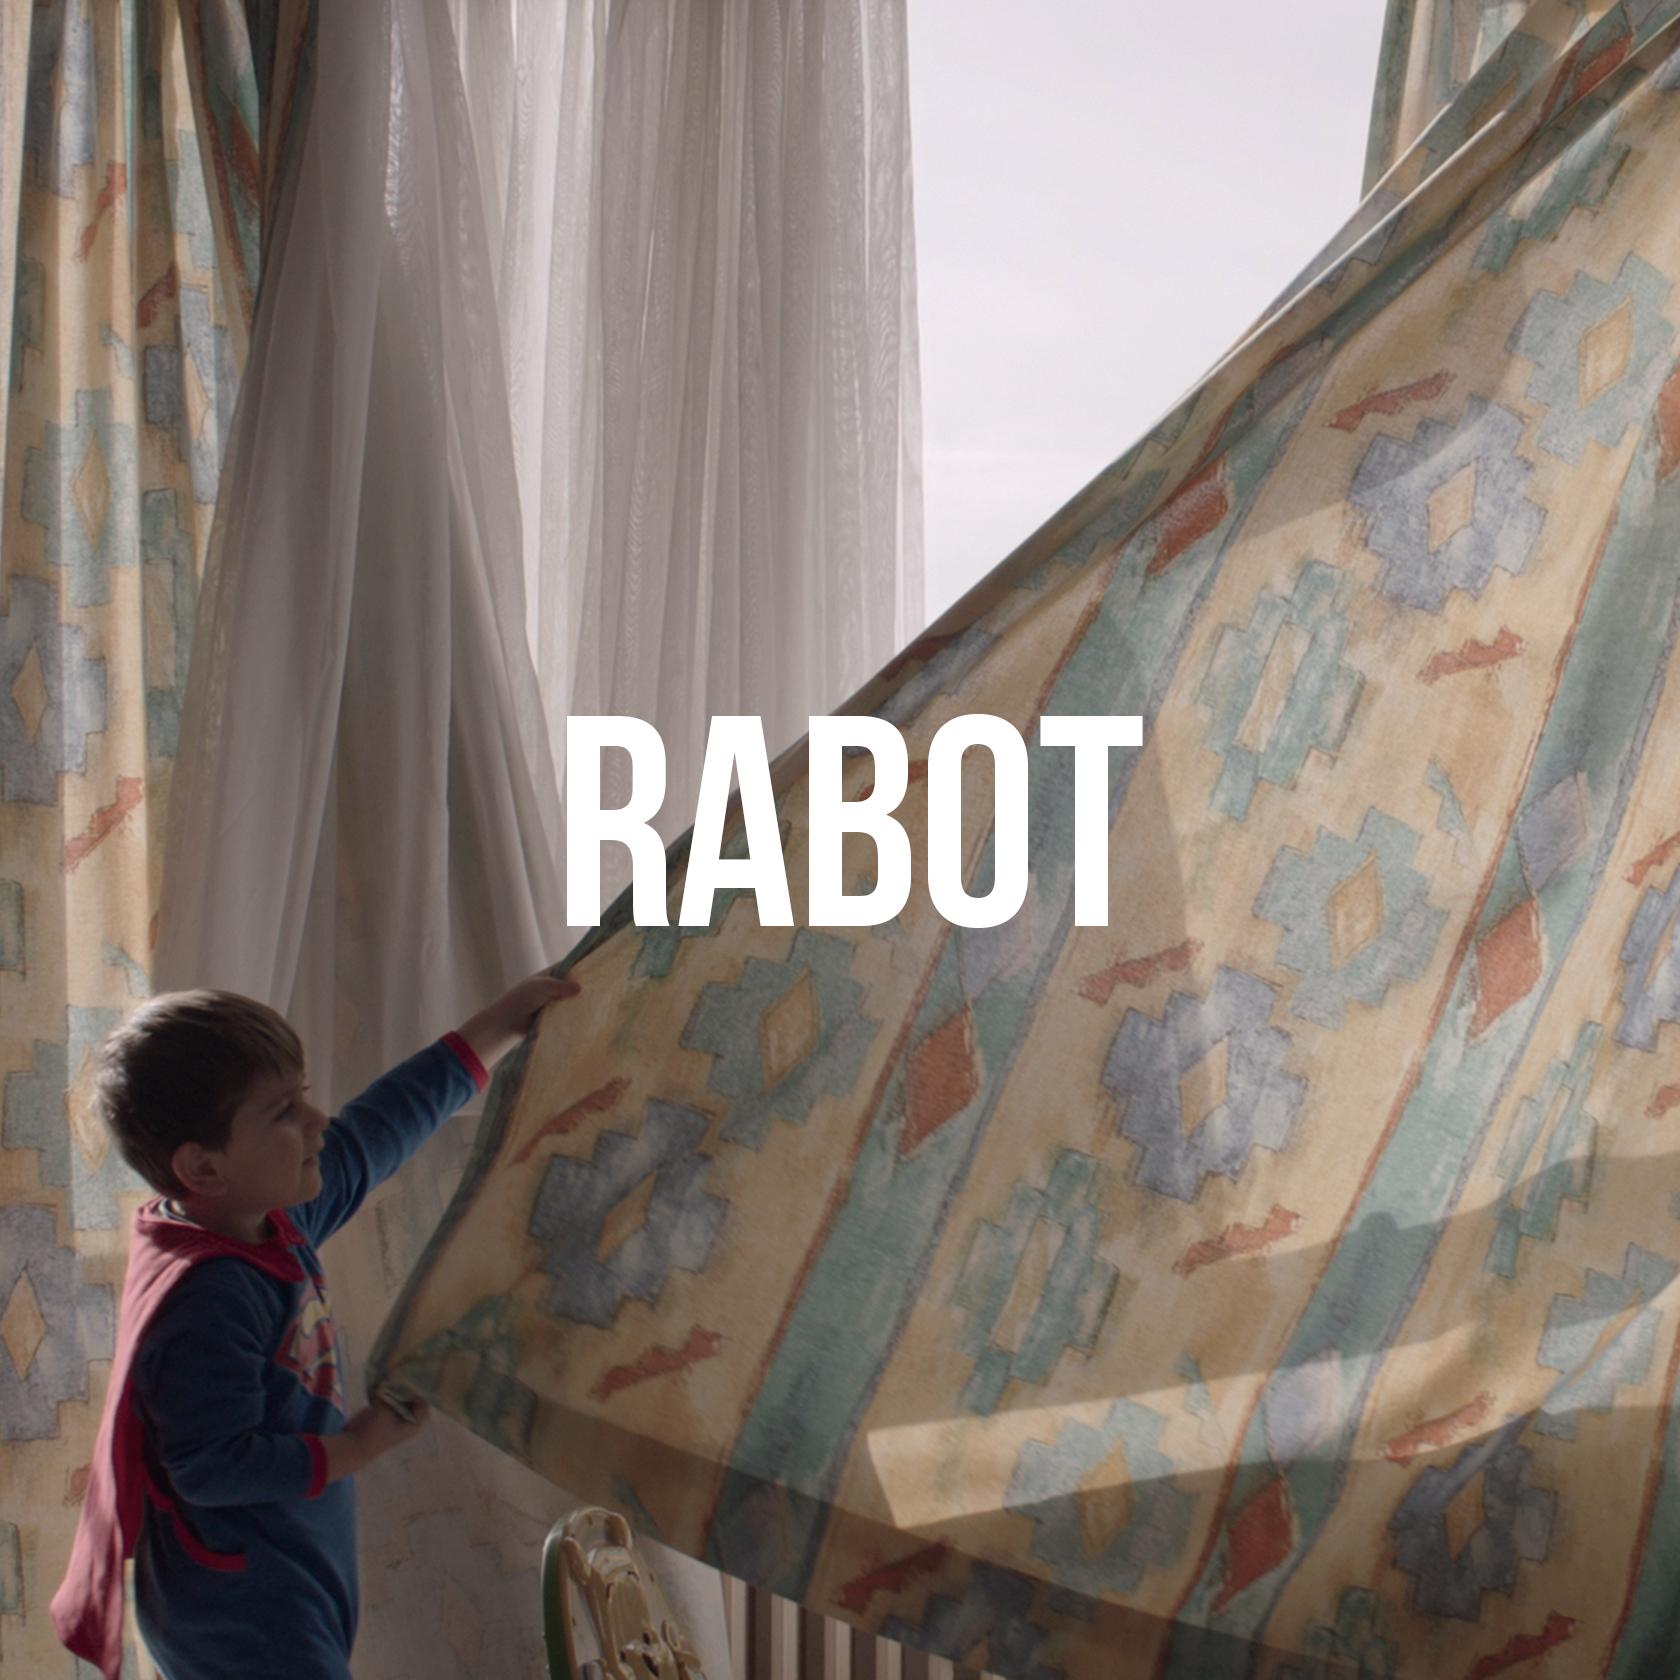 Rabot.jpg